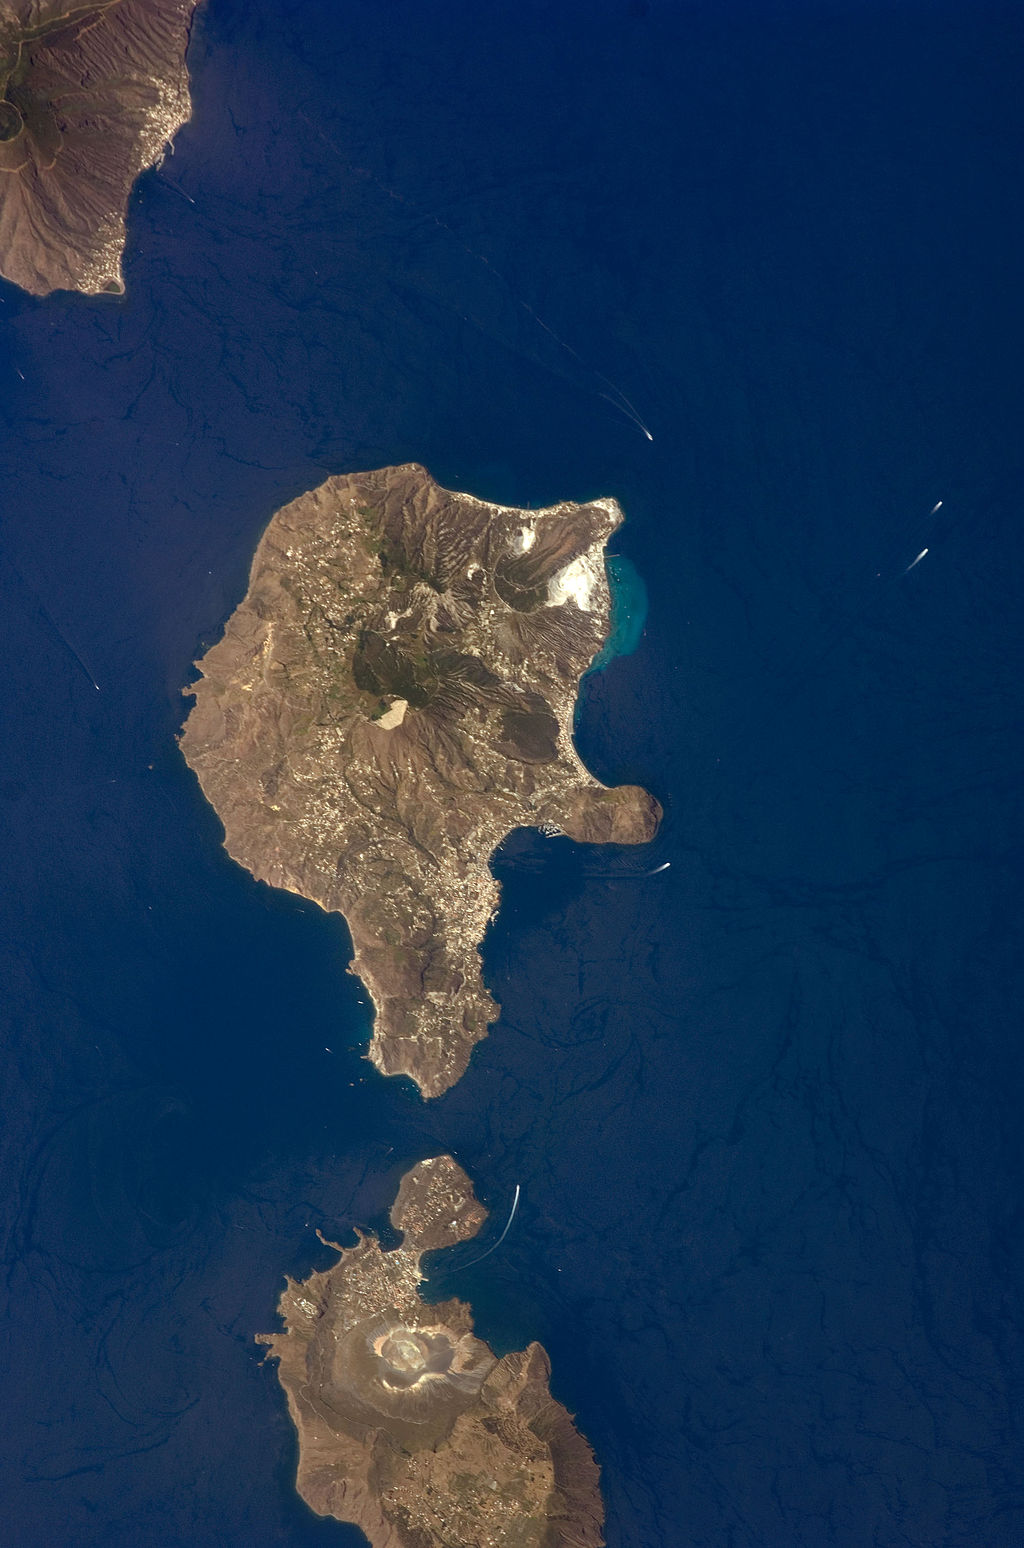 1024px-Aeolian_Islands_Lipari.jpg